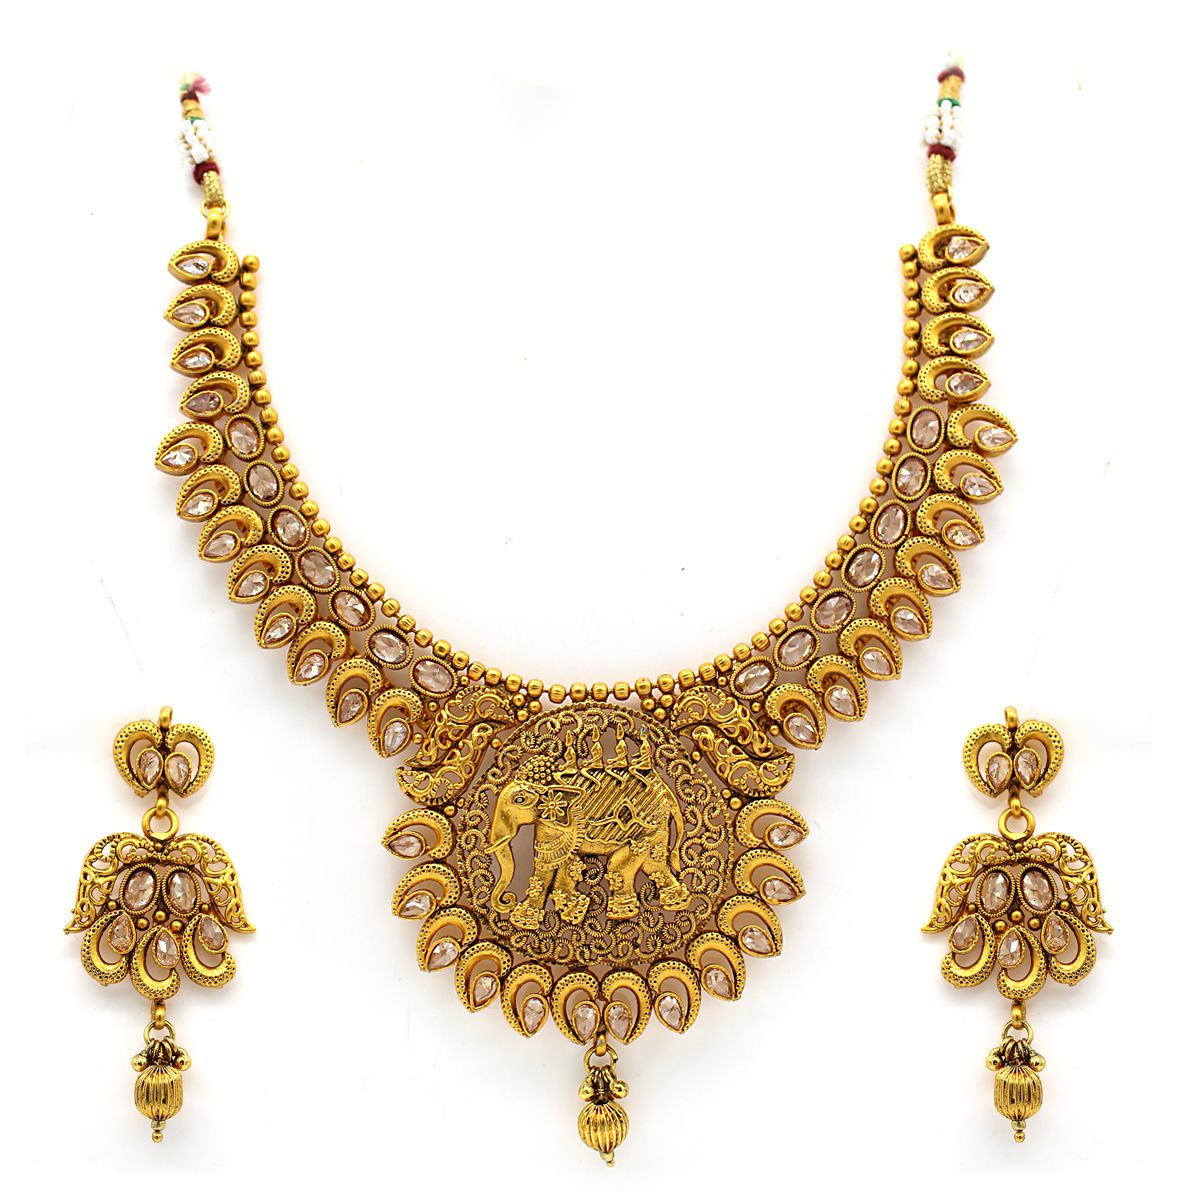 Indi Creation Presenting You Premium Quality Tradtional Bahubali Jewellery Set For Women